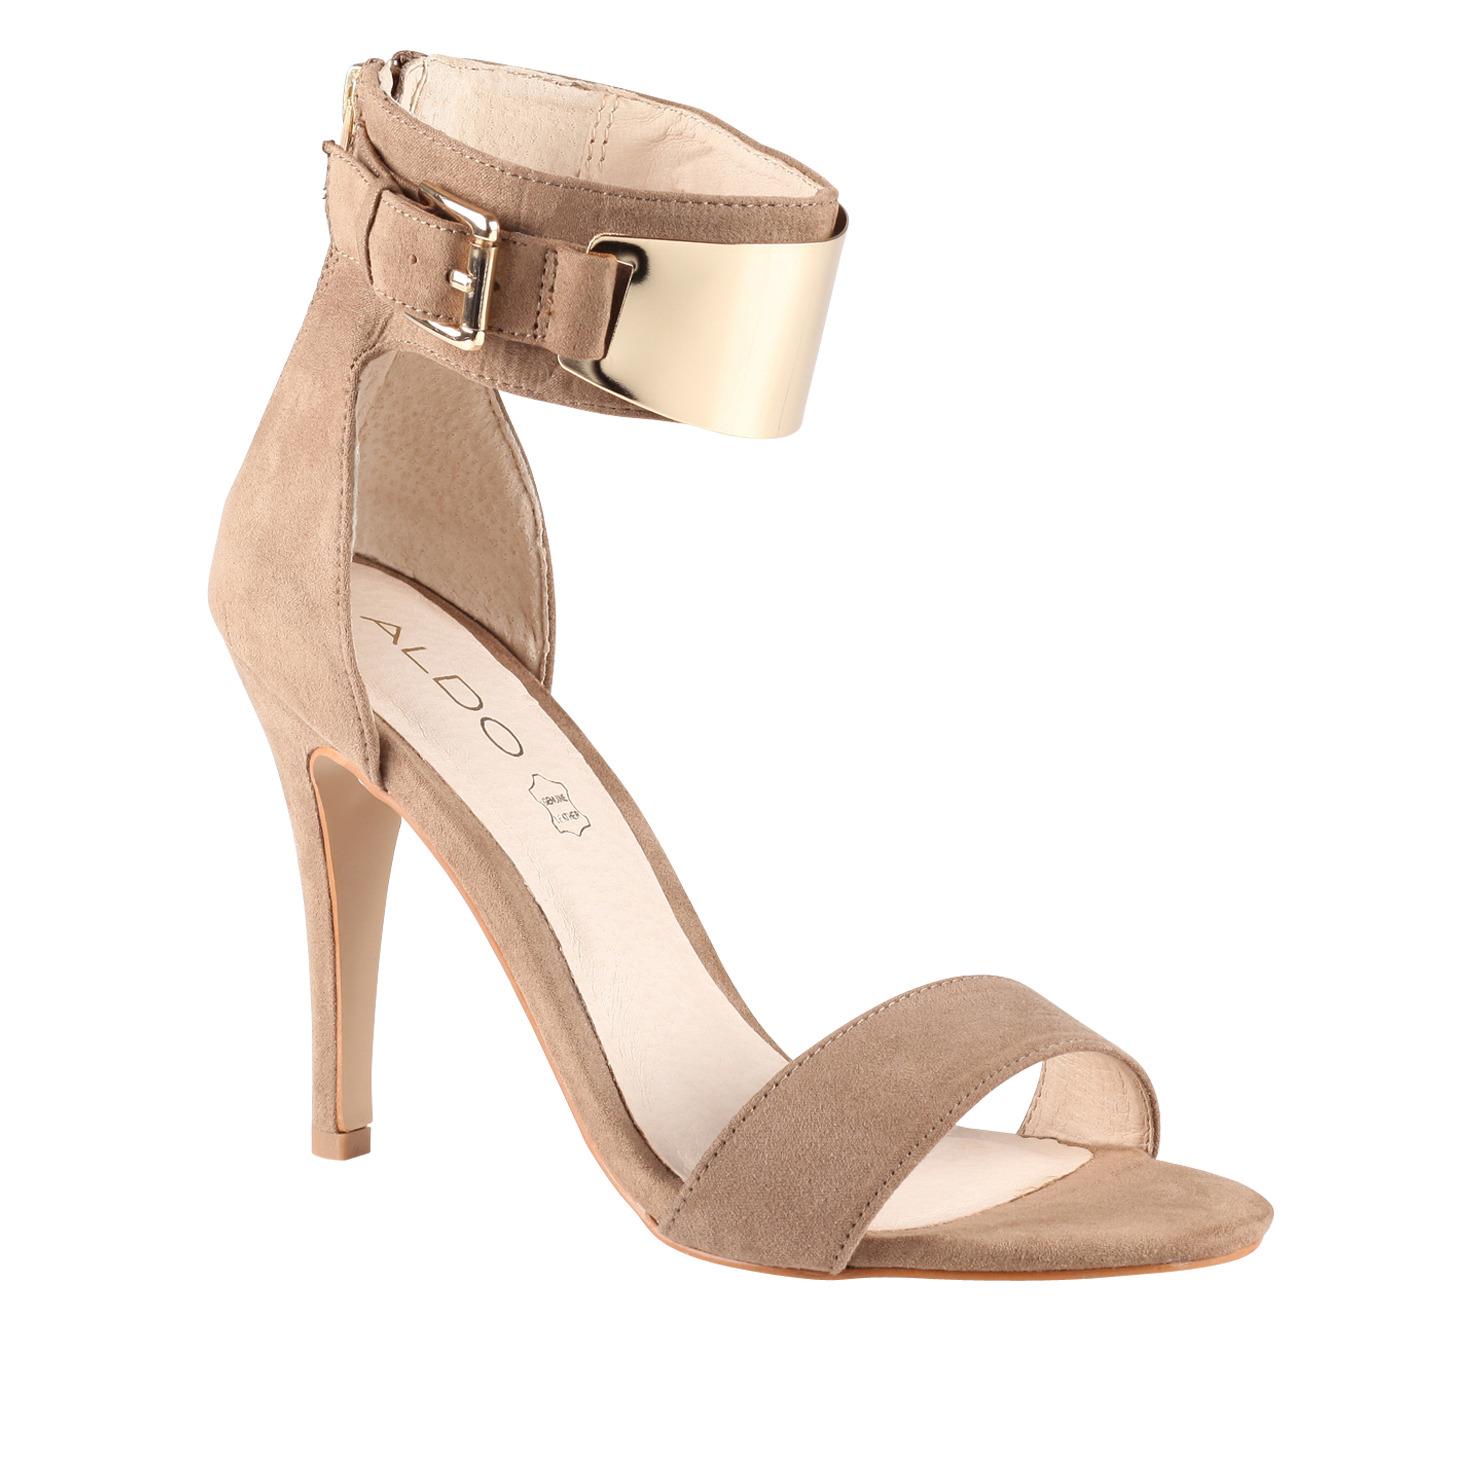 ff8380c648c Head over Heels + style inspiration - imhayleywon